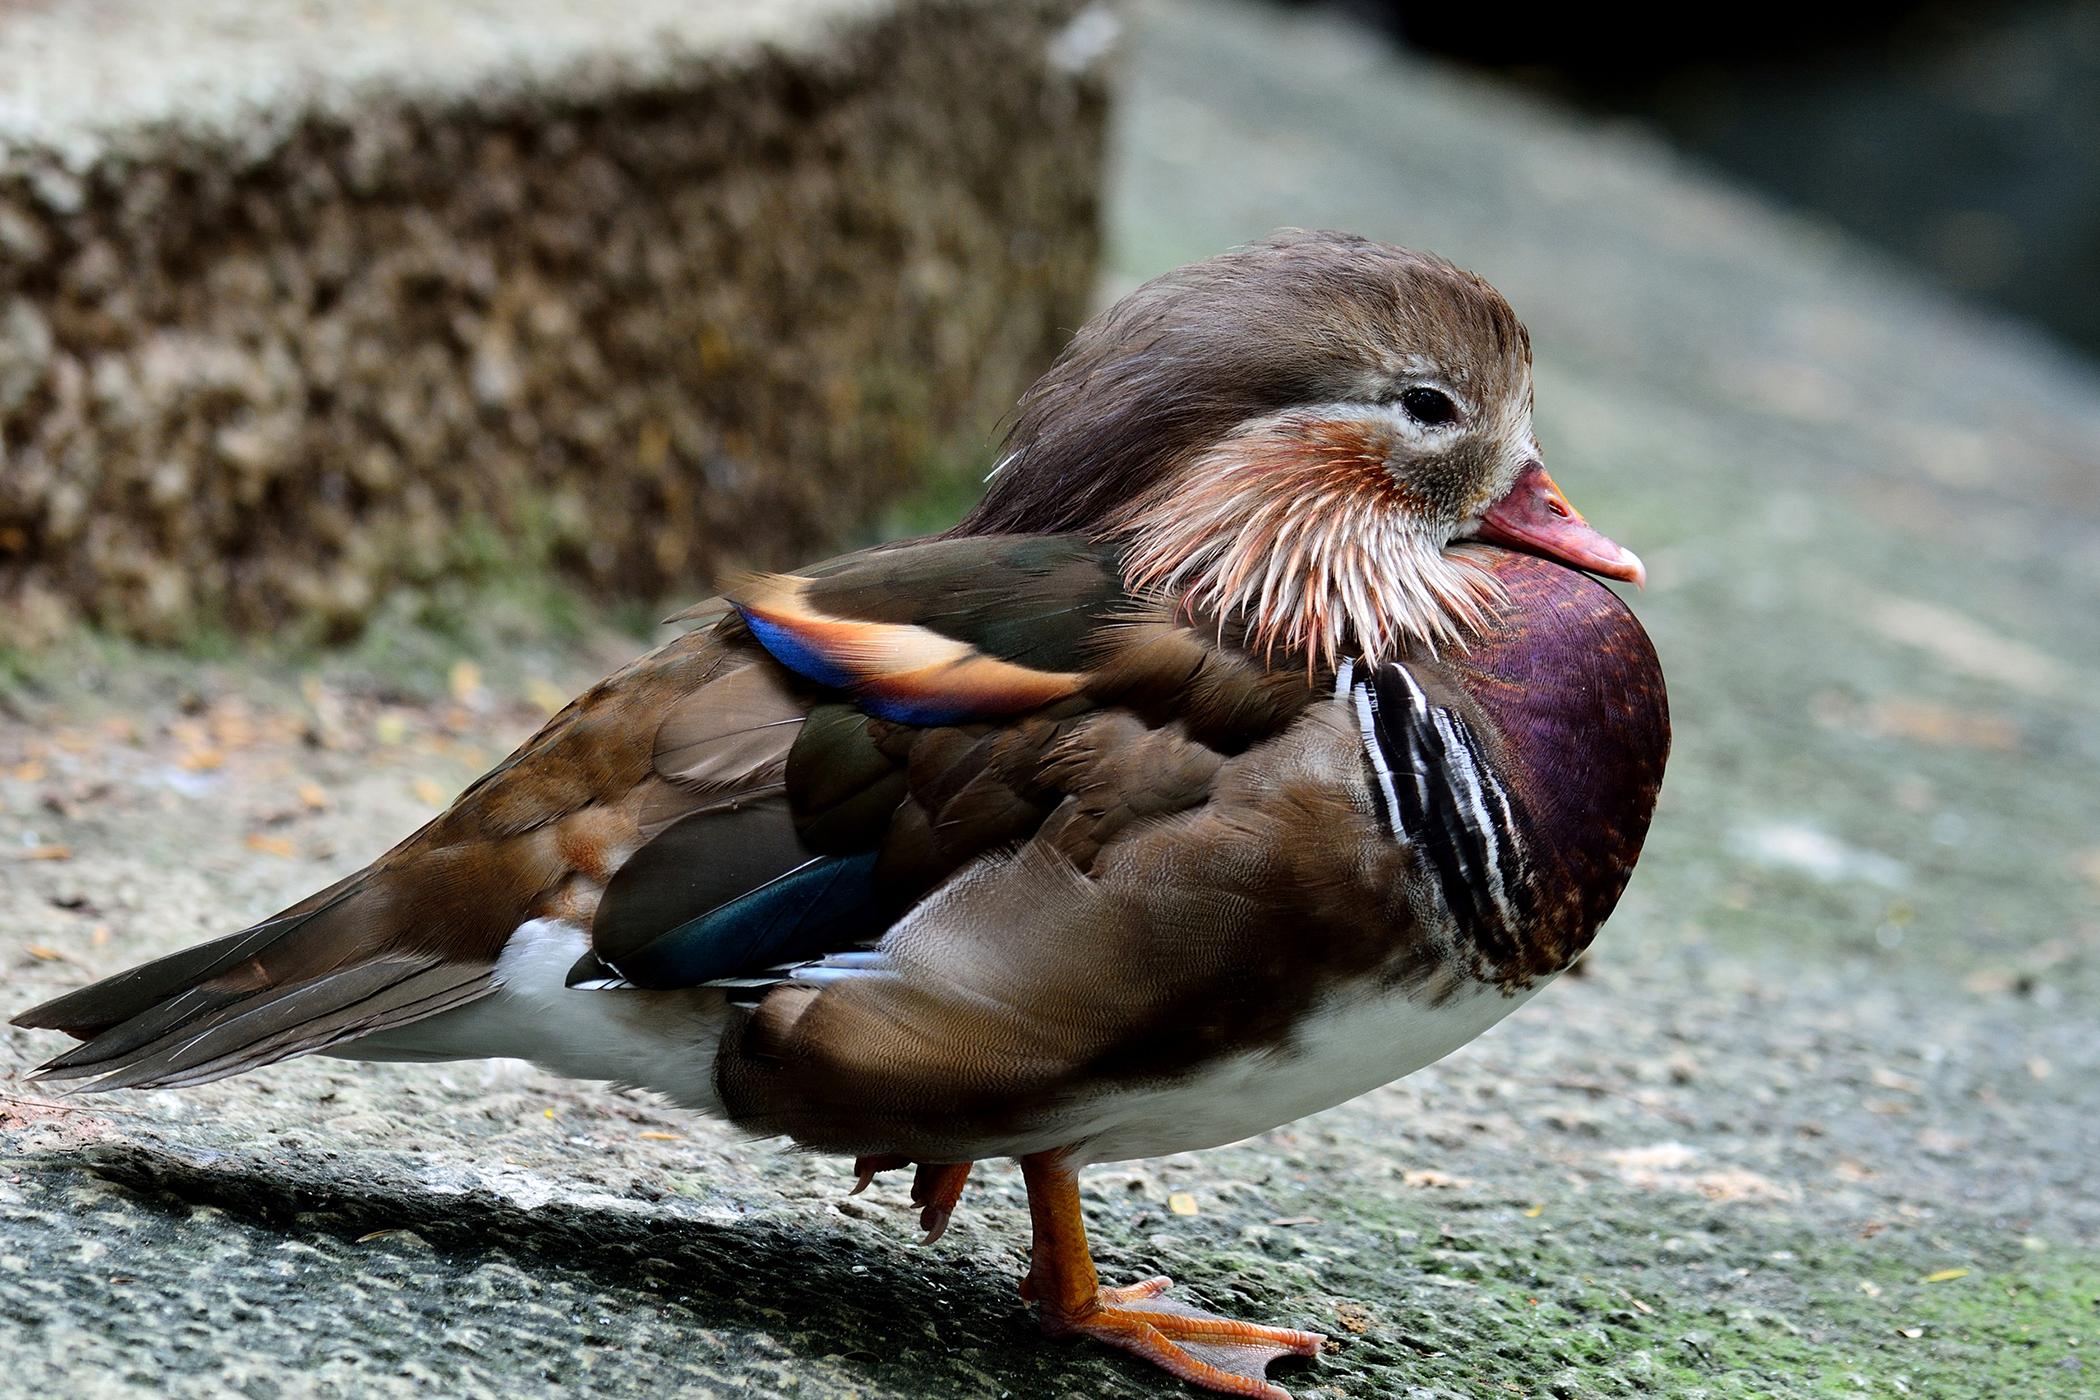 Trichomoniasis in Birds